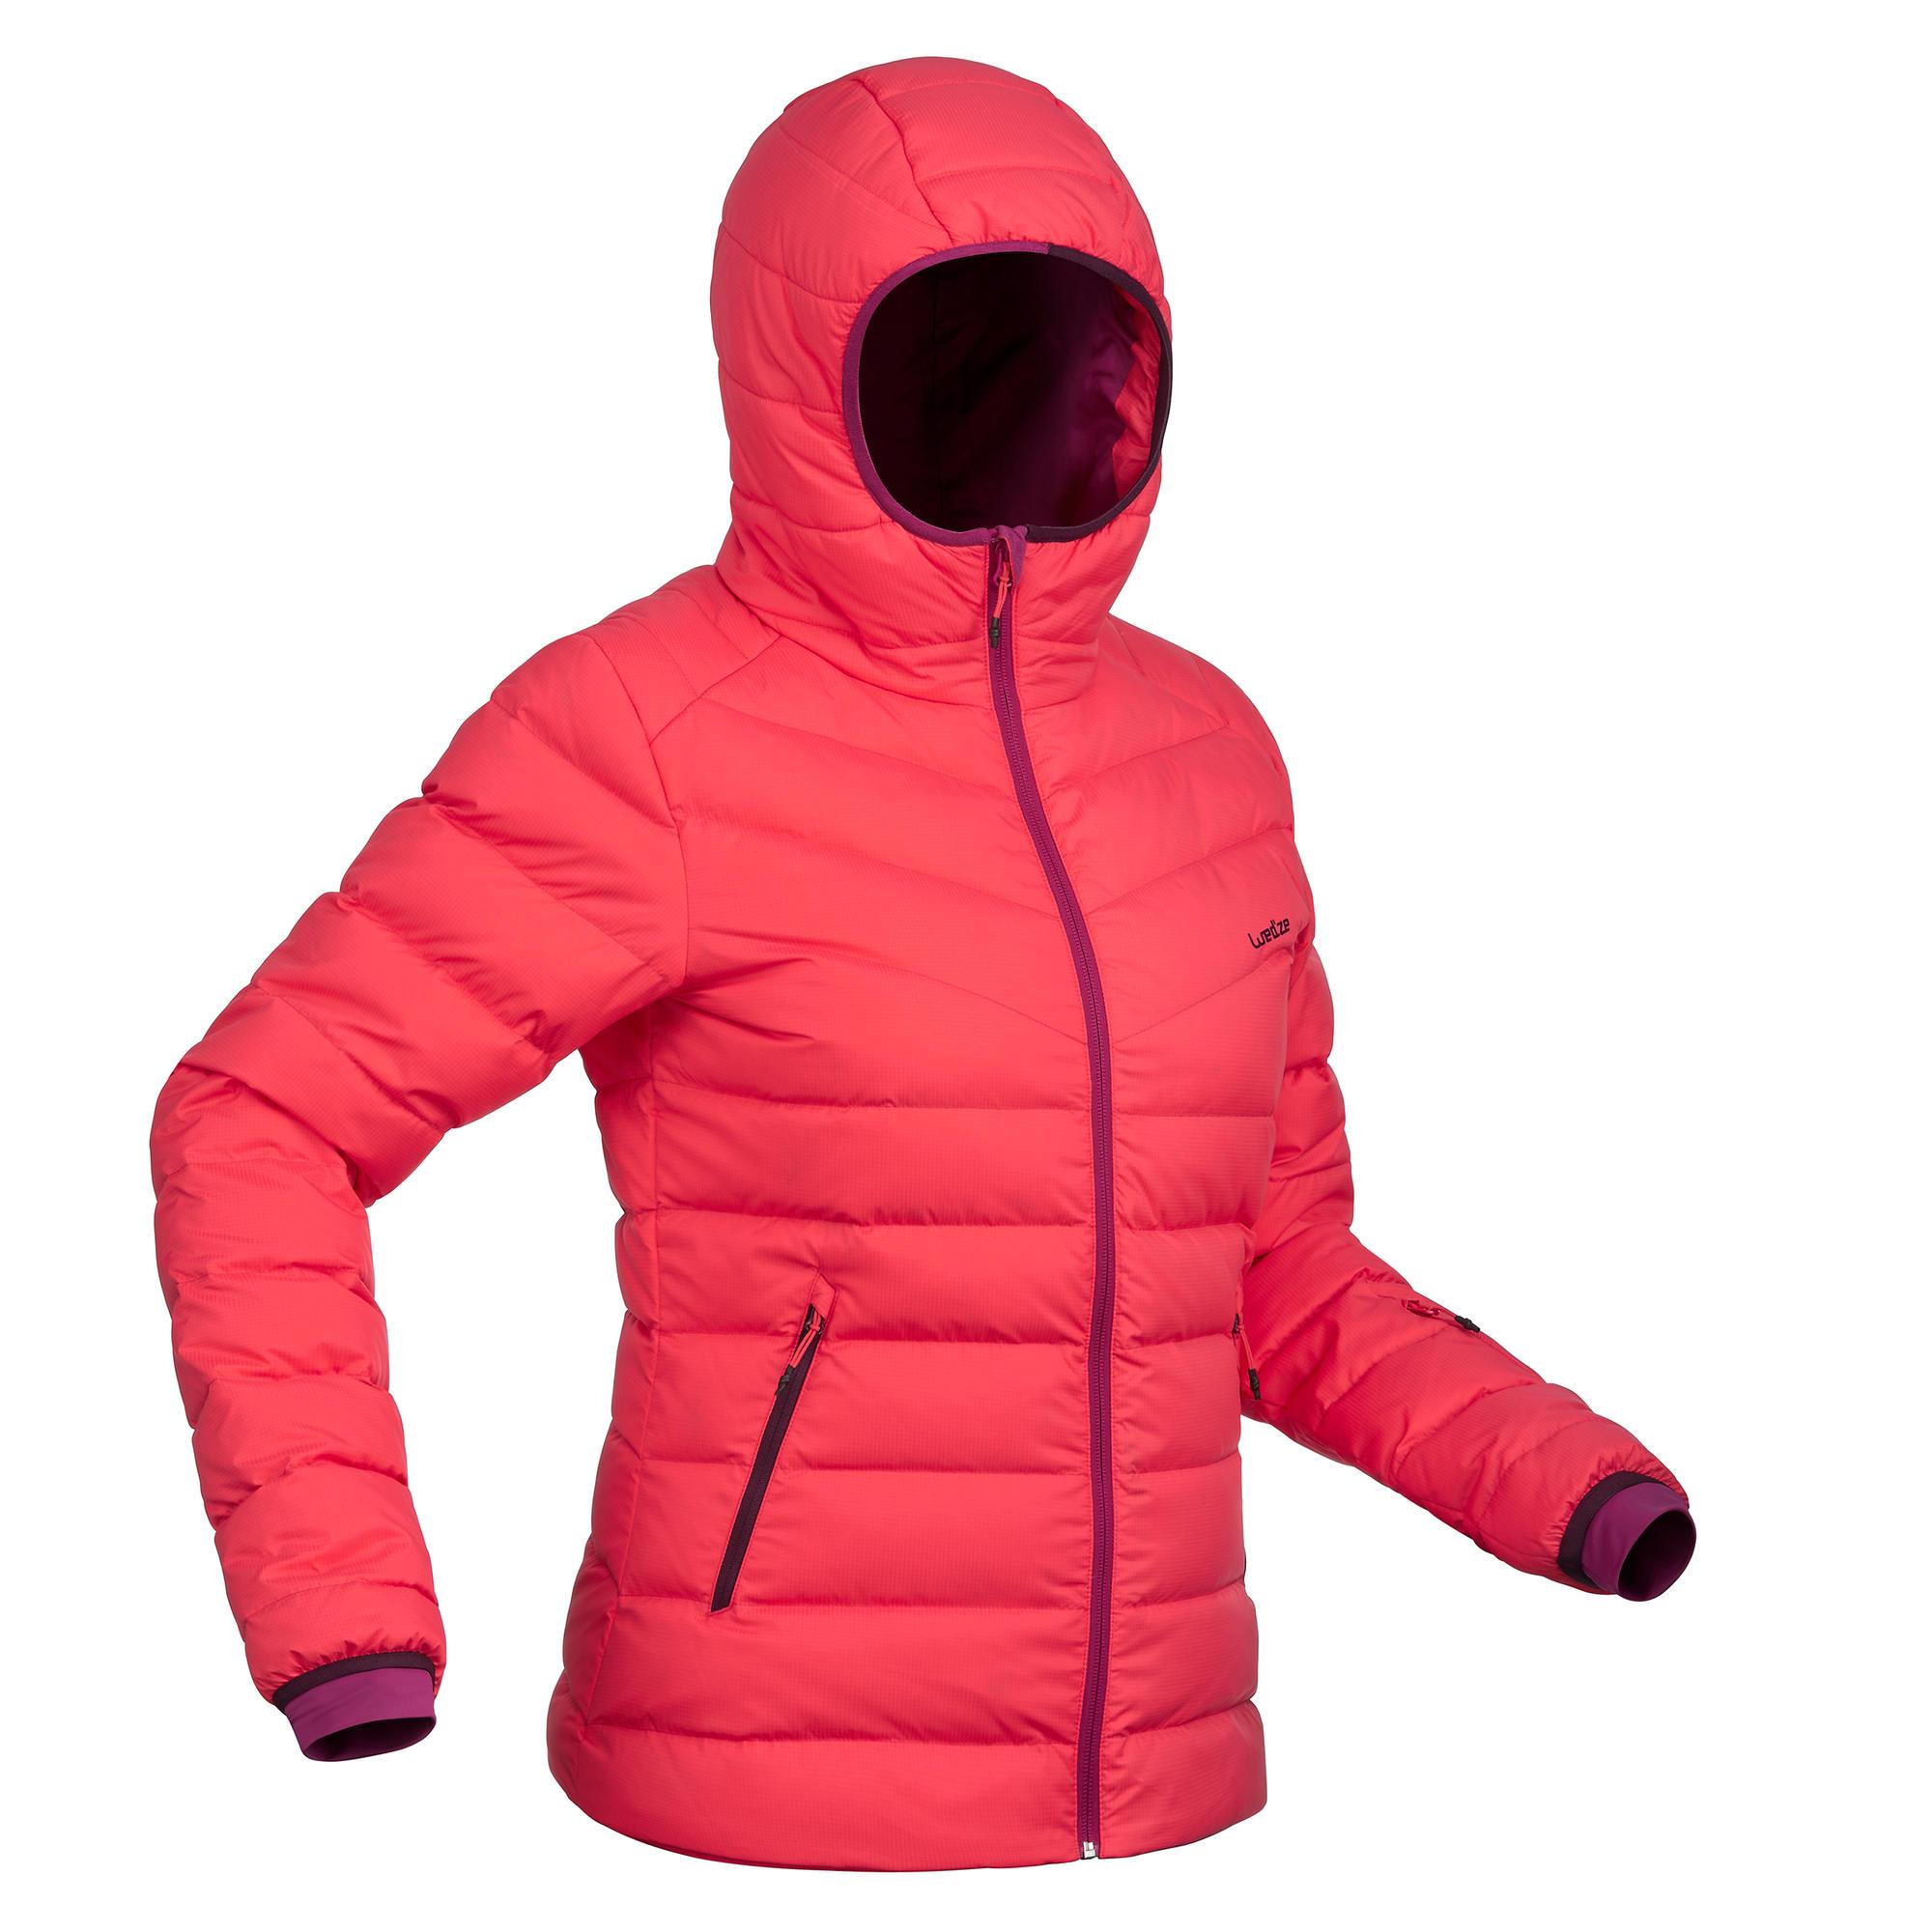 1201dd33240 Femme Warm De Rose Wedze Jkt 500 Ski Doudoune Aqwnxg1pg